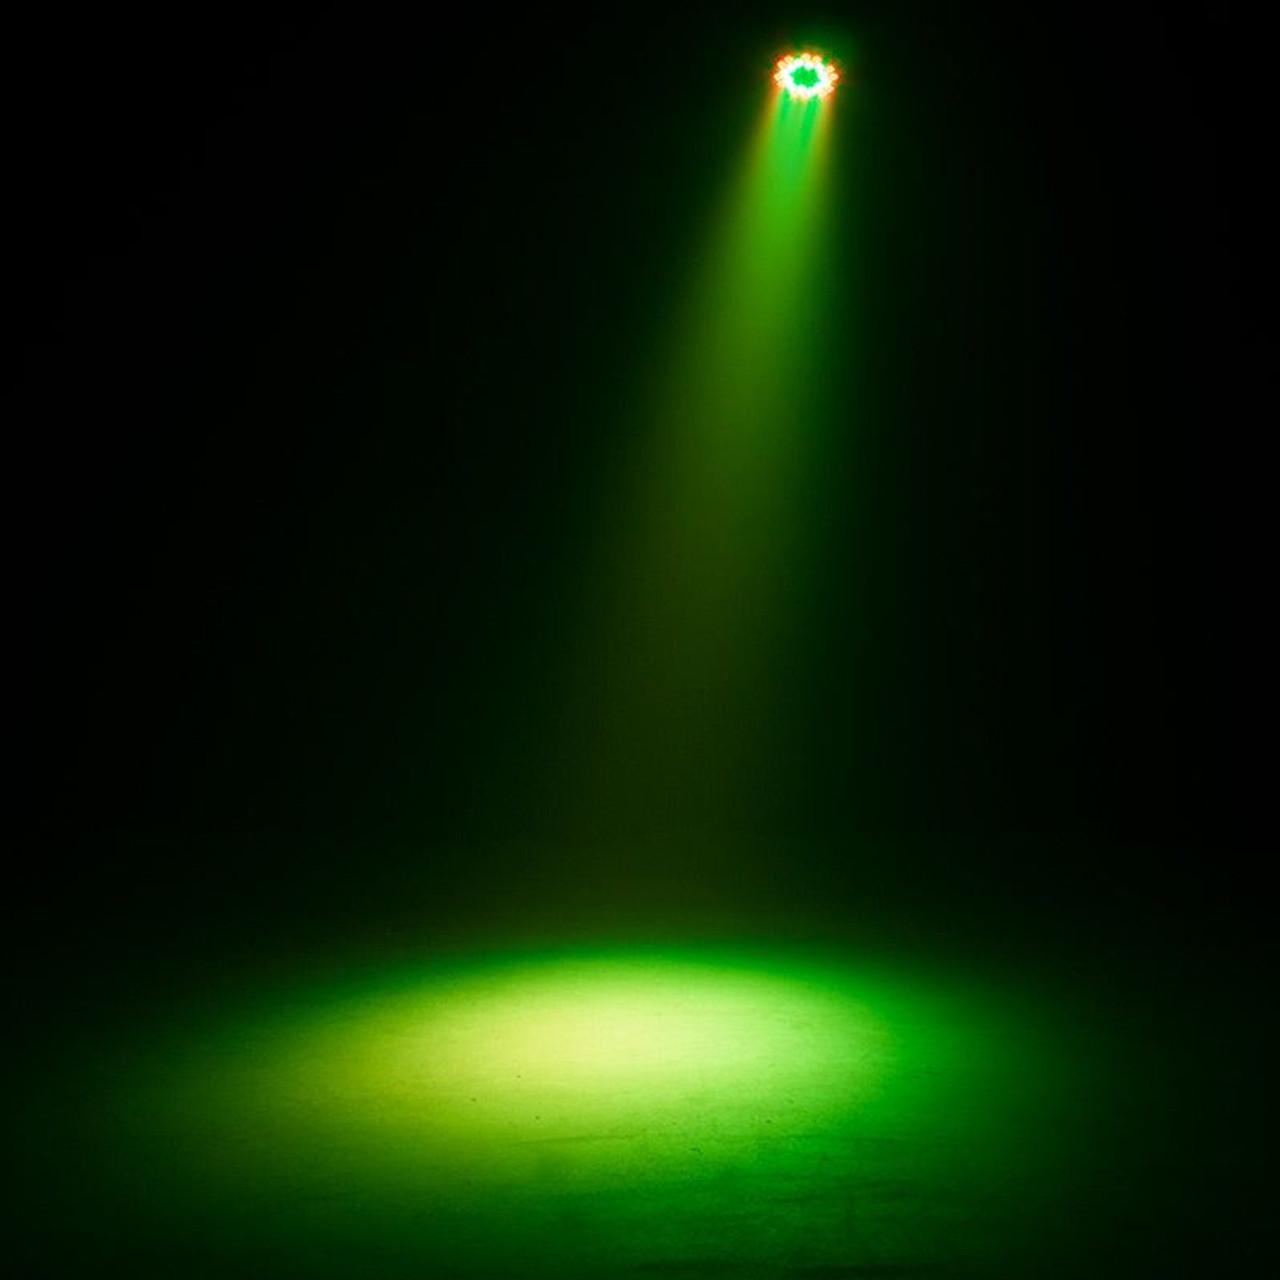 Eliminator LP 42 RGBW LED Par Can Light